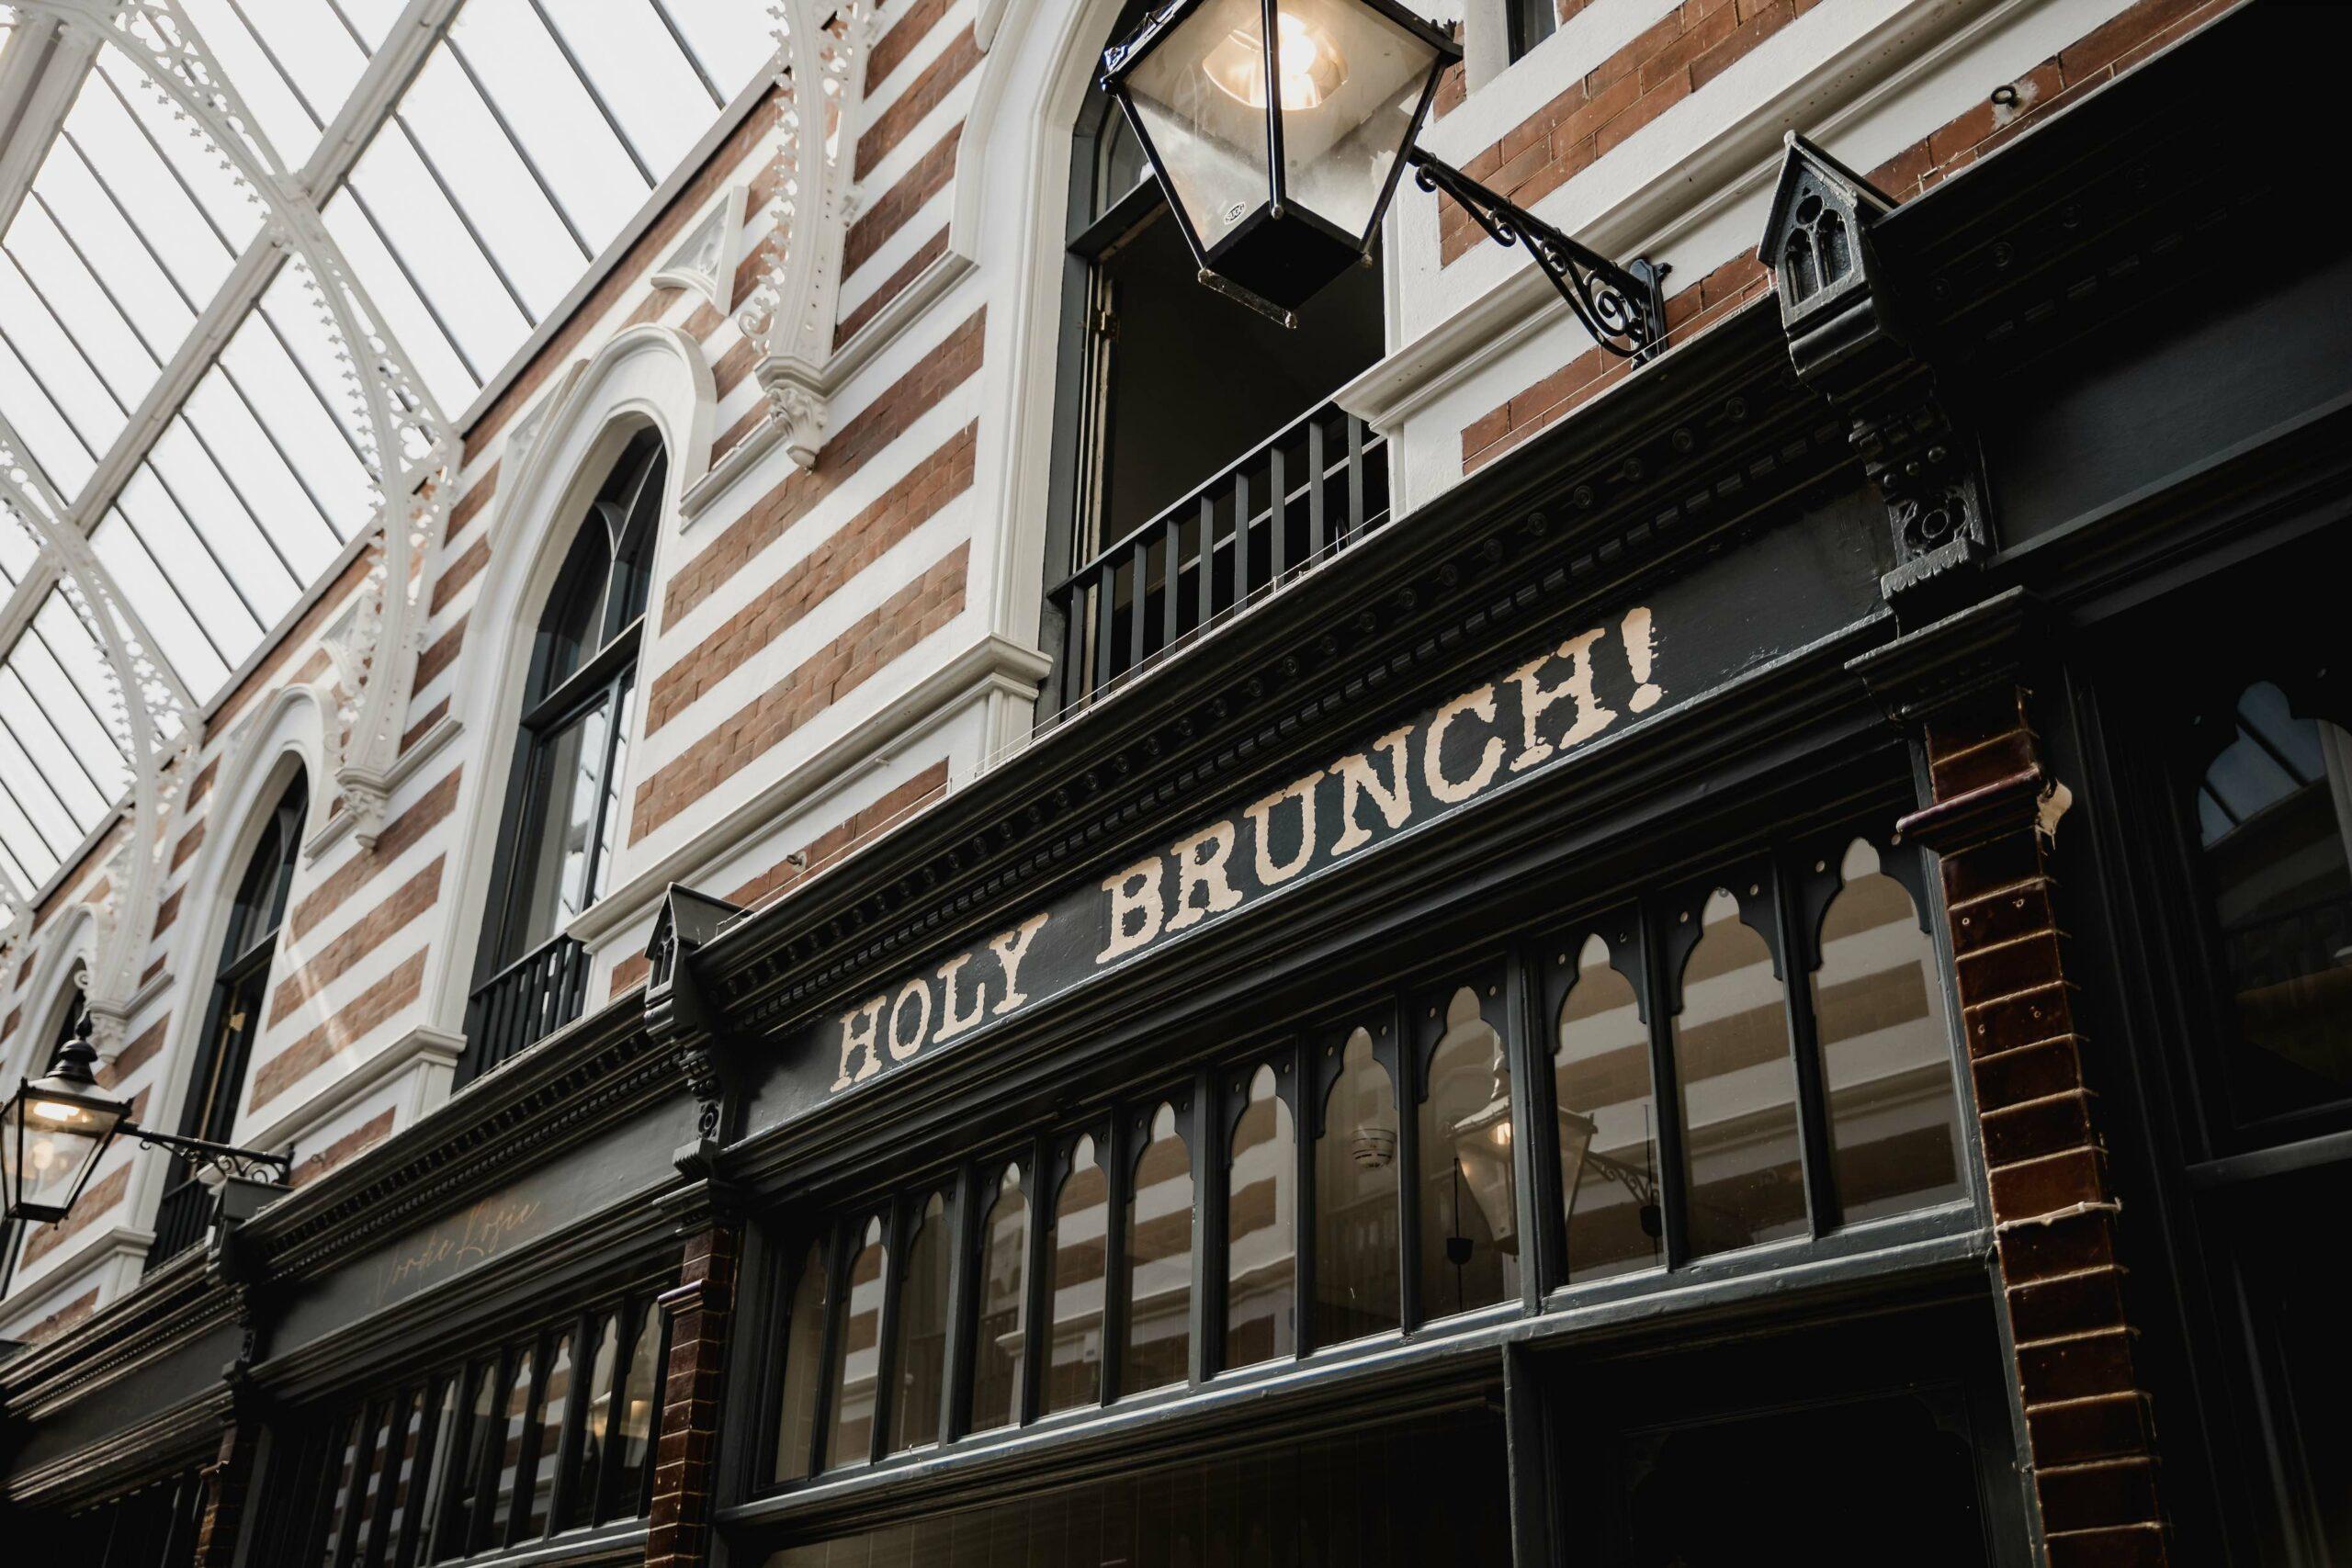 Bring on the brunch